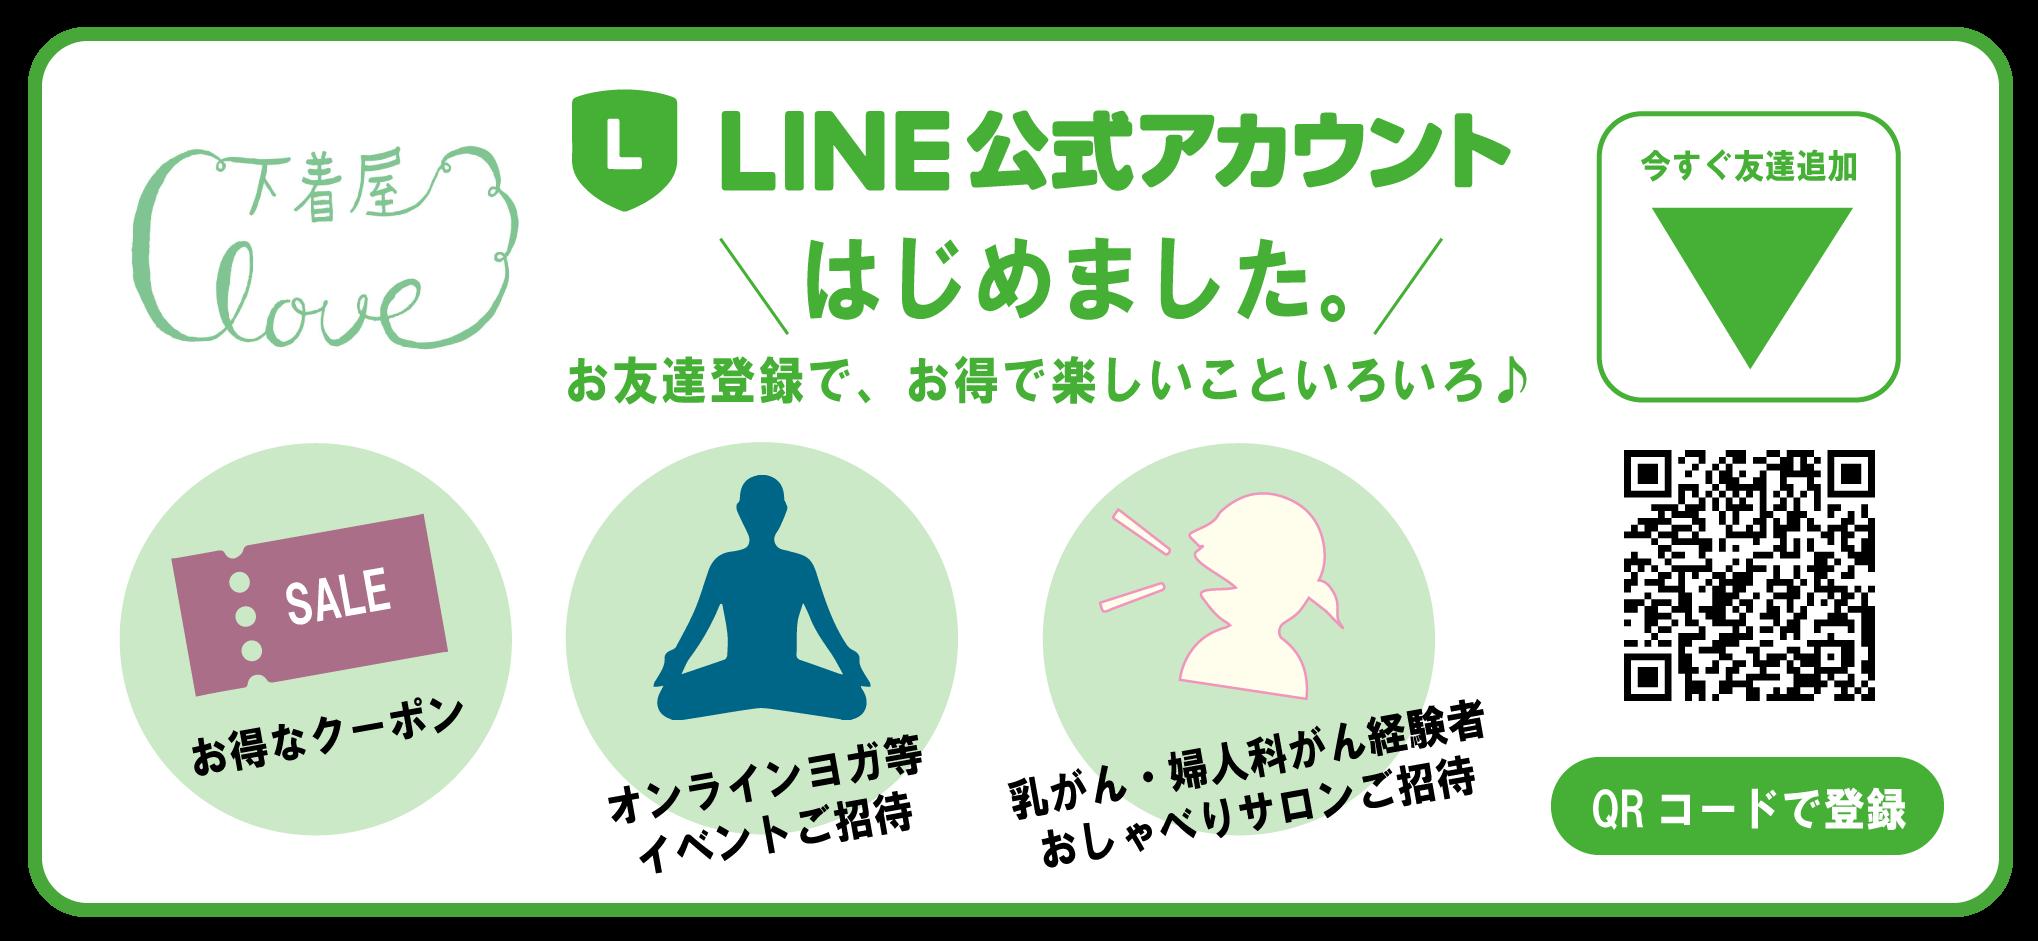 LINE公式友達募集